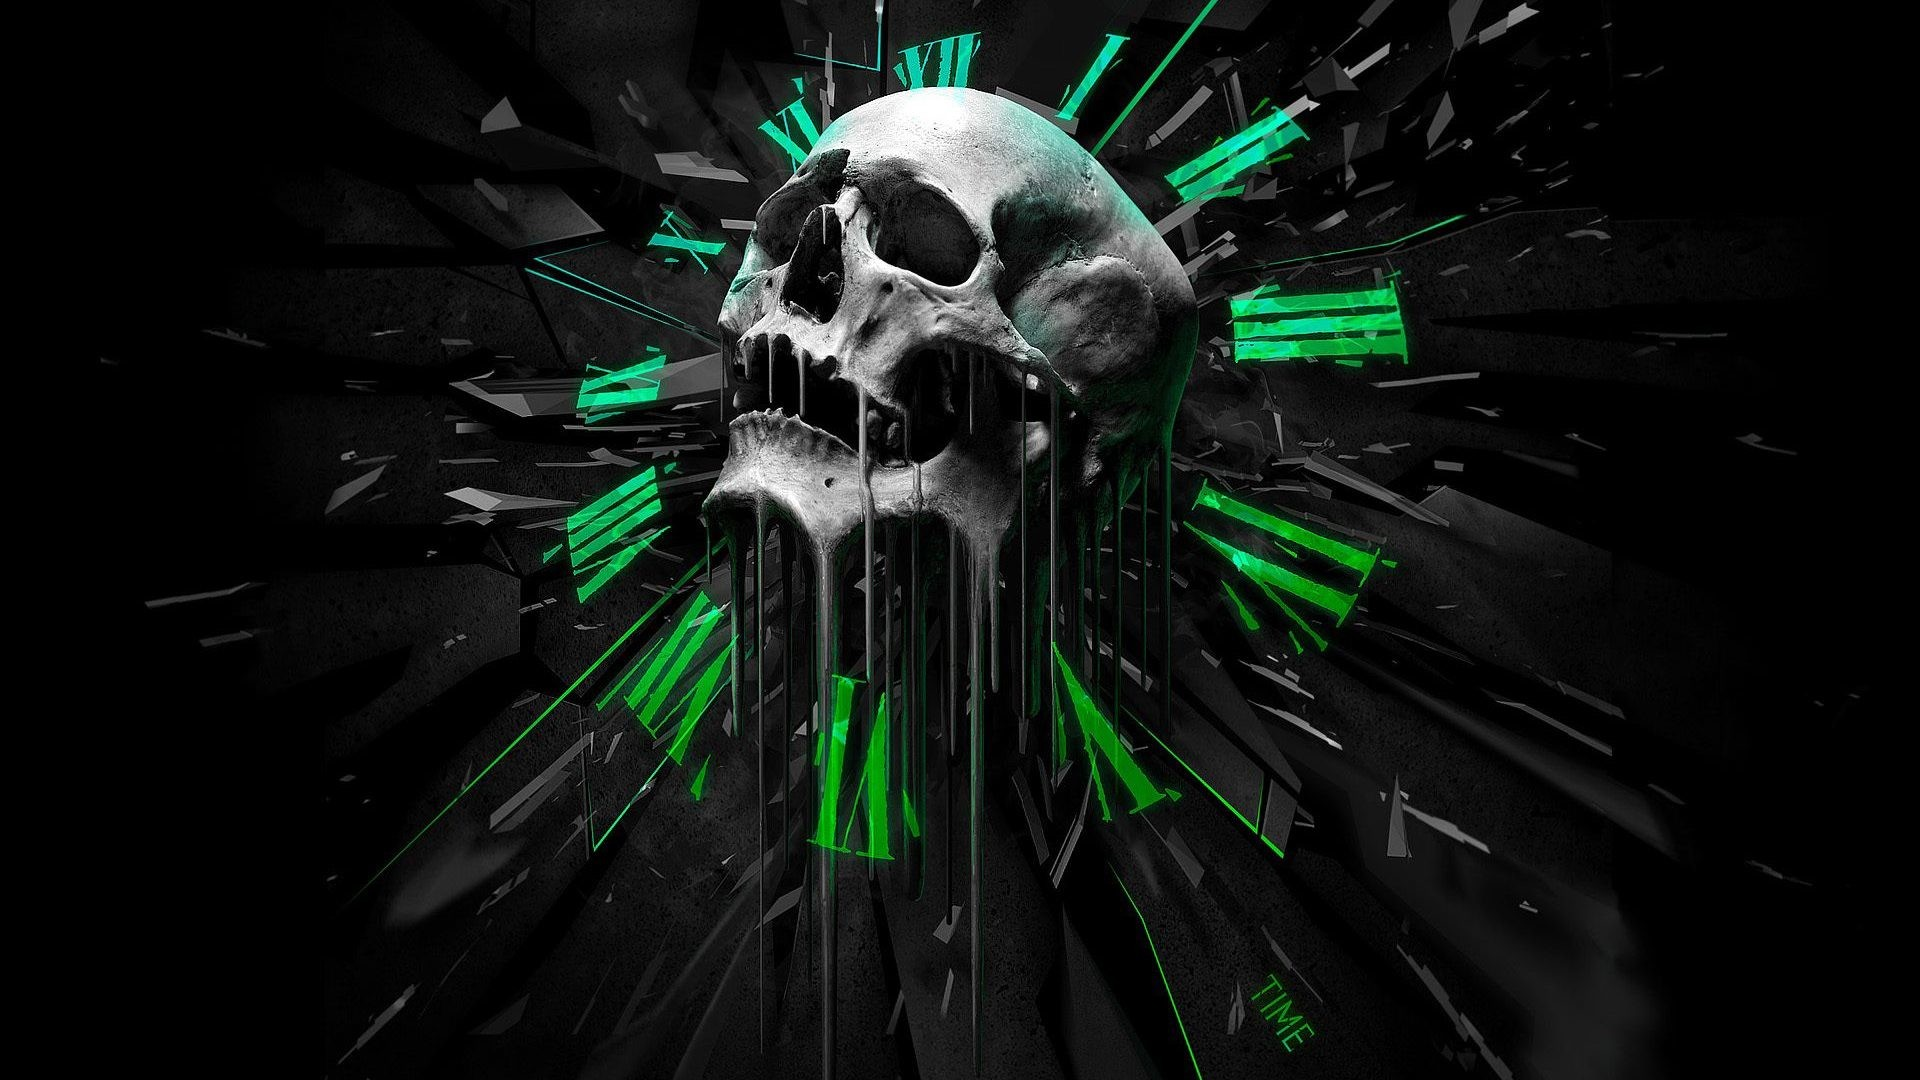 3D Art Skull 4k ultra hd backgrounds wallpaper – HD Wallpapers